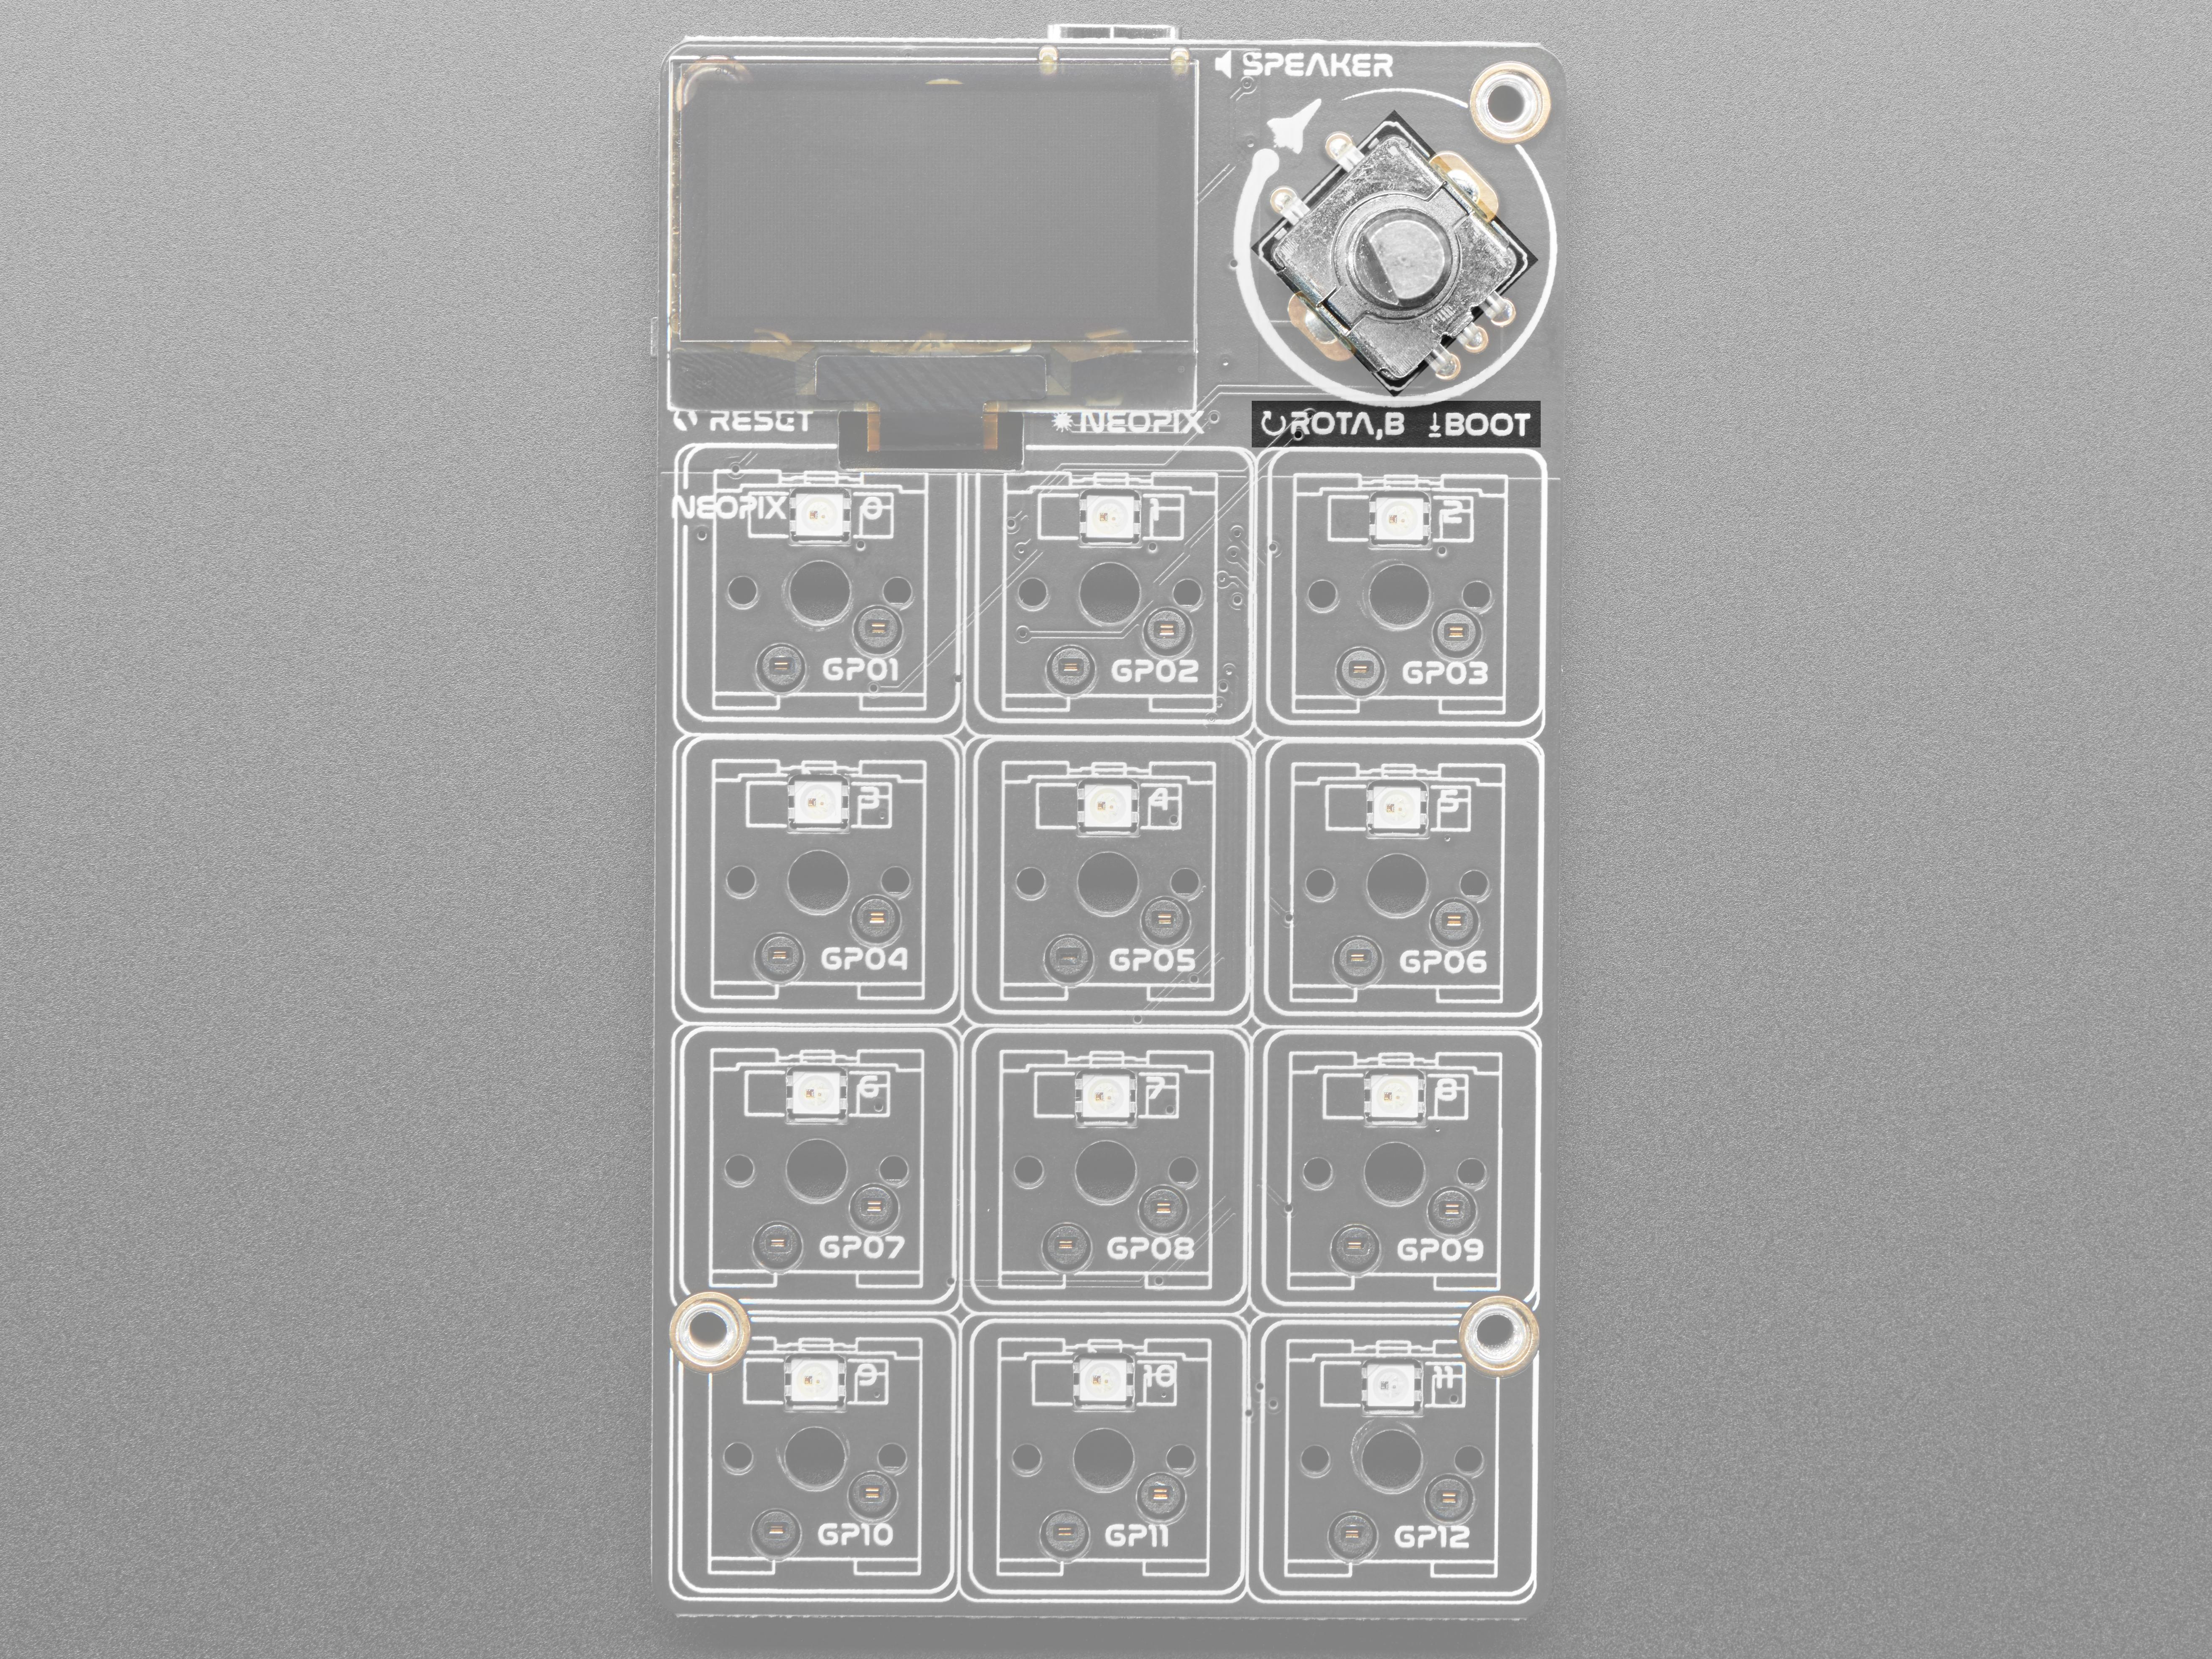 adafruit_products_MacroPad_pinouts_rotary_encoder_boot.jpg